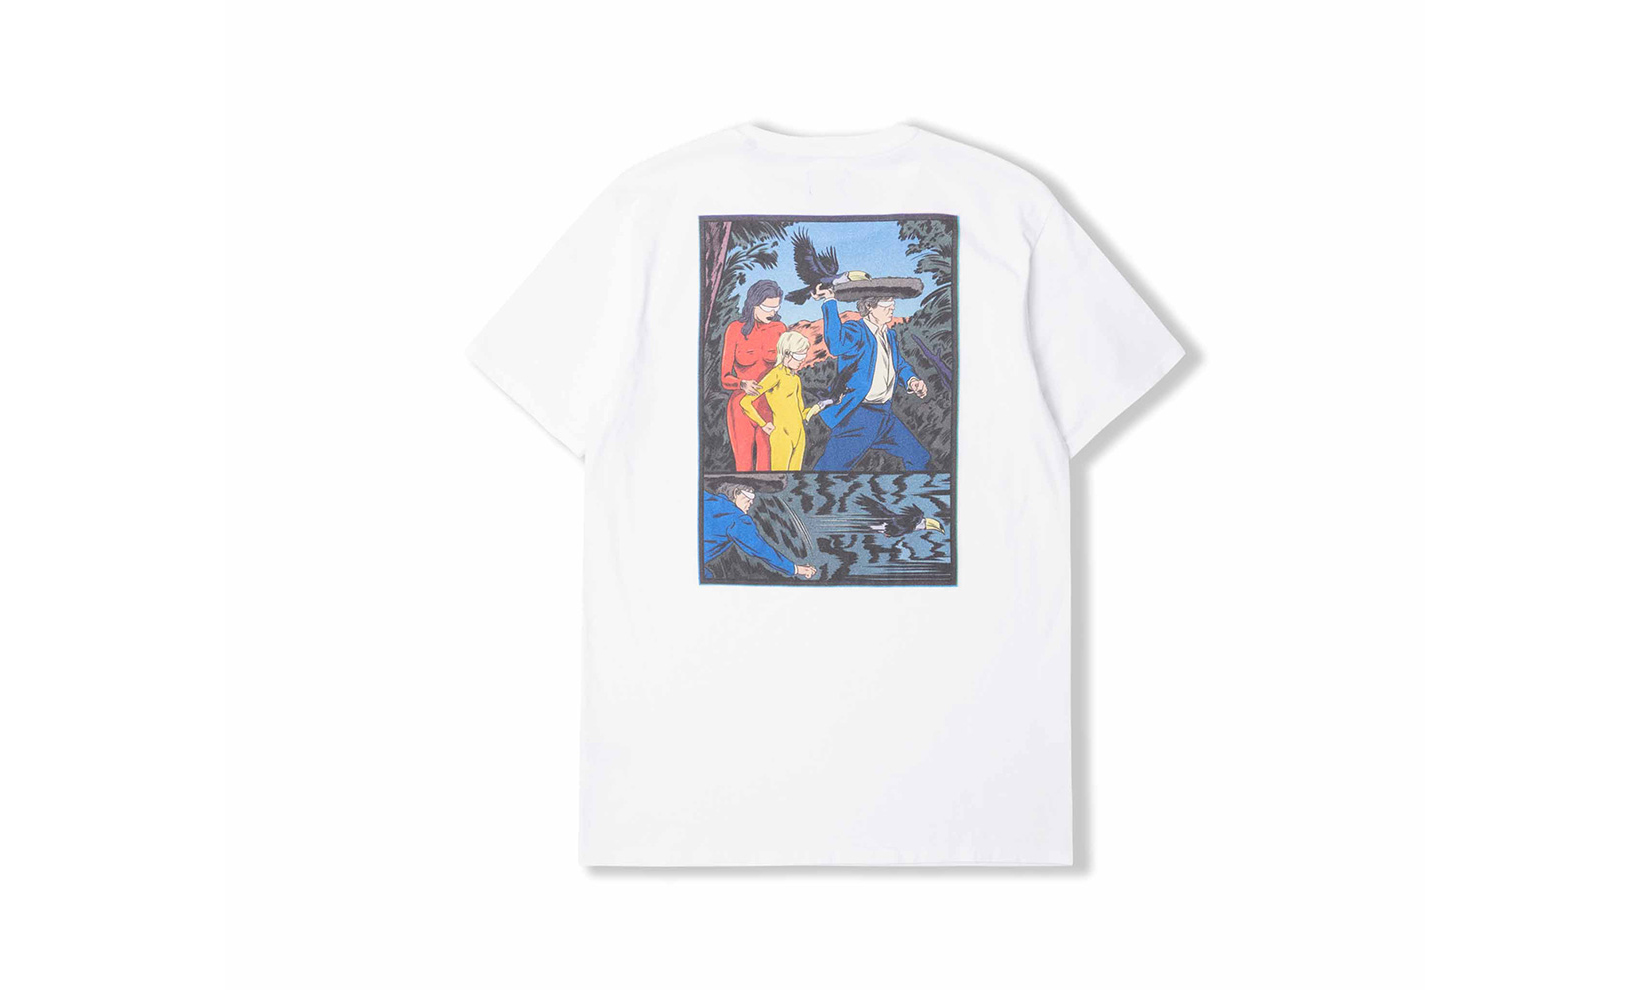 EDWIN 联手艺术家 Ugo Bienvenu 打造科幻插画 T-Shirt